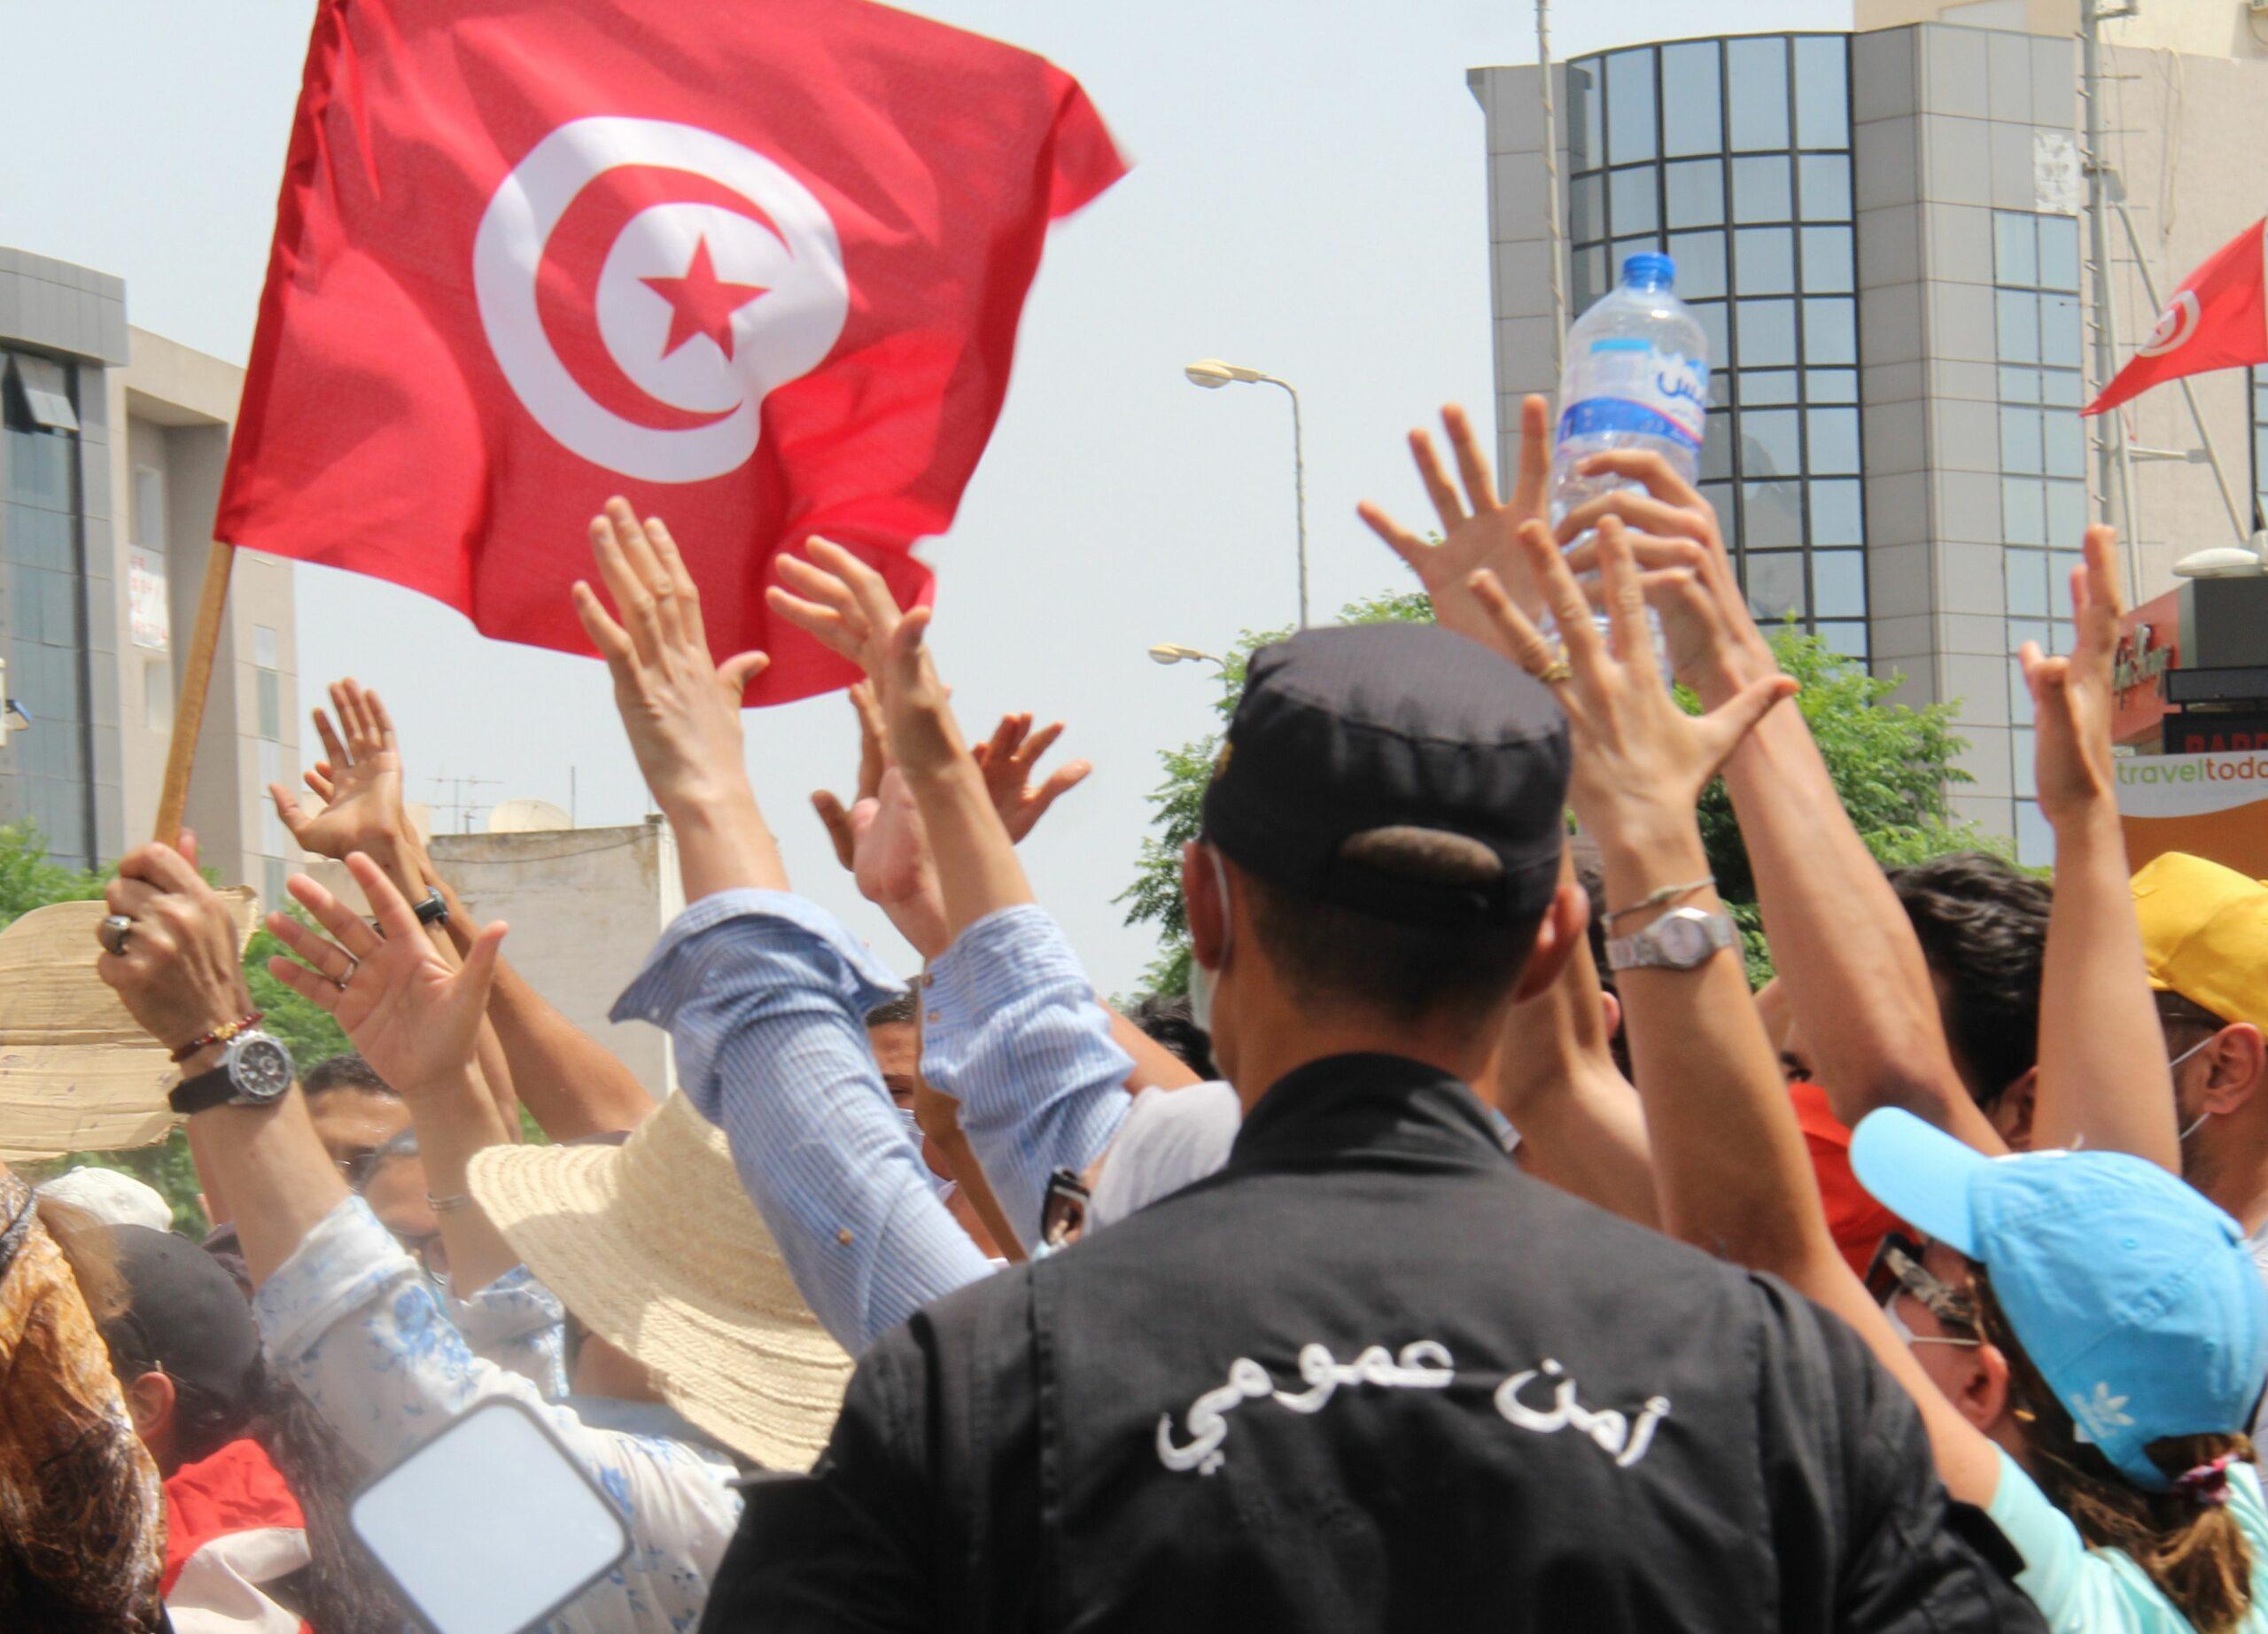 golpe tunisia